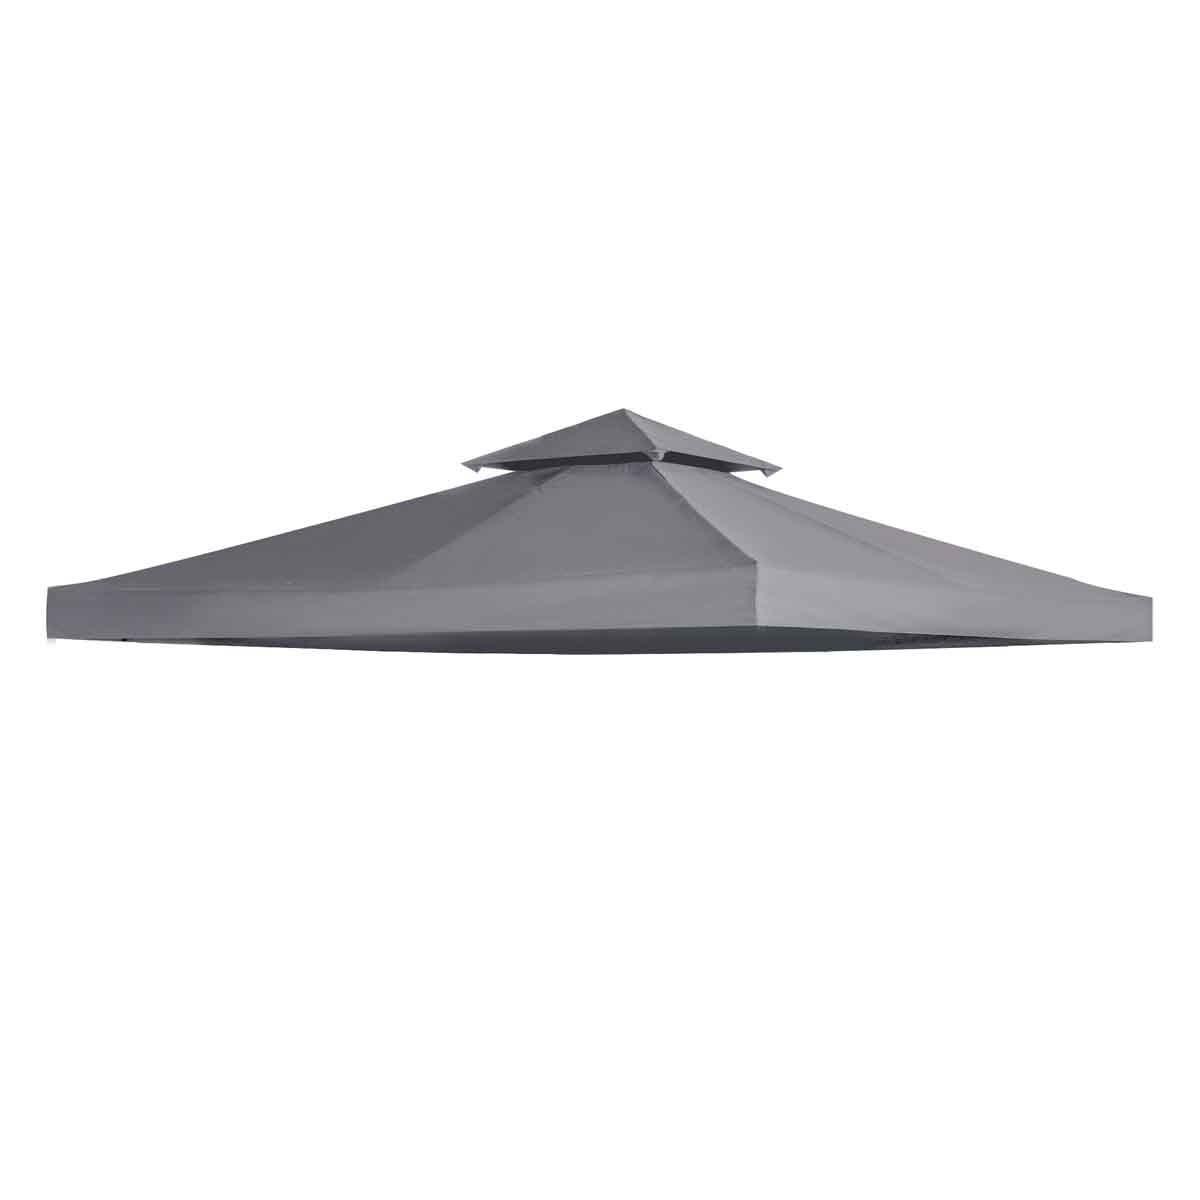 Outsunny 3x3m Replacement Gazebo Canopy - Grey